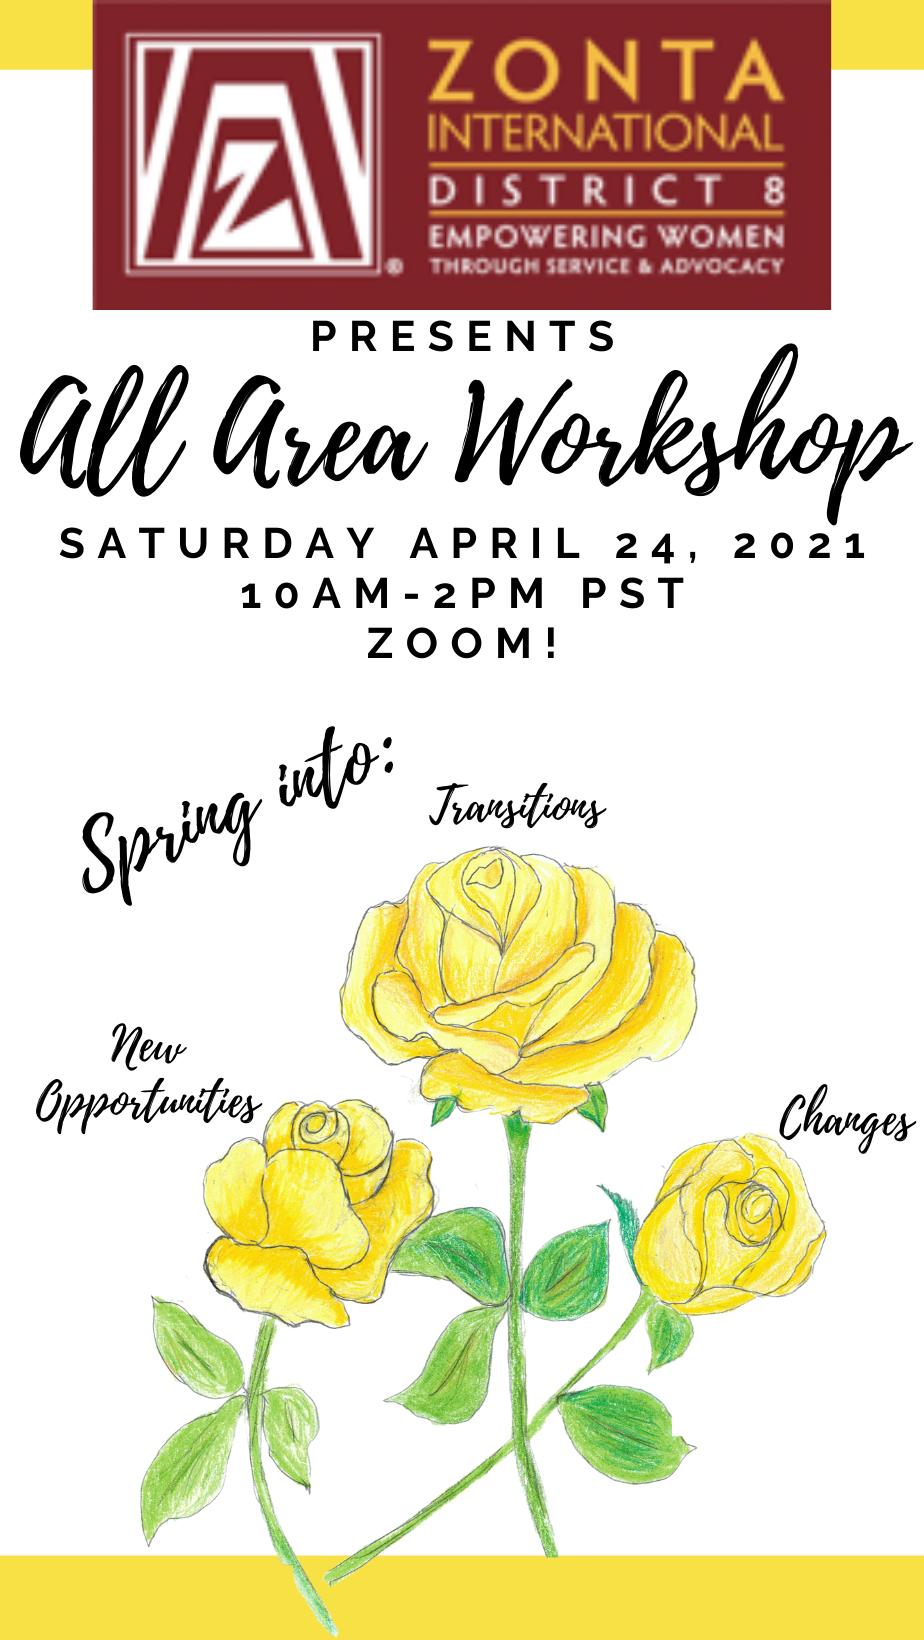 All Area Workshop flier